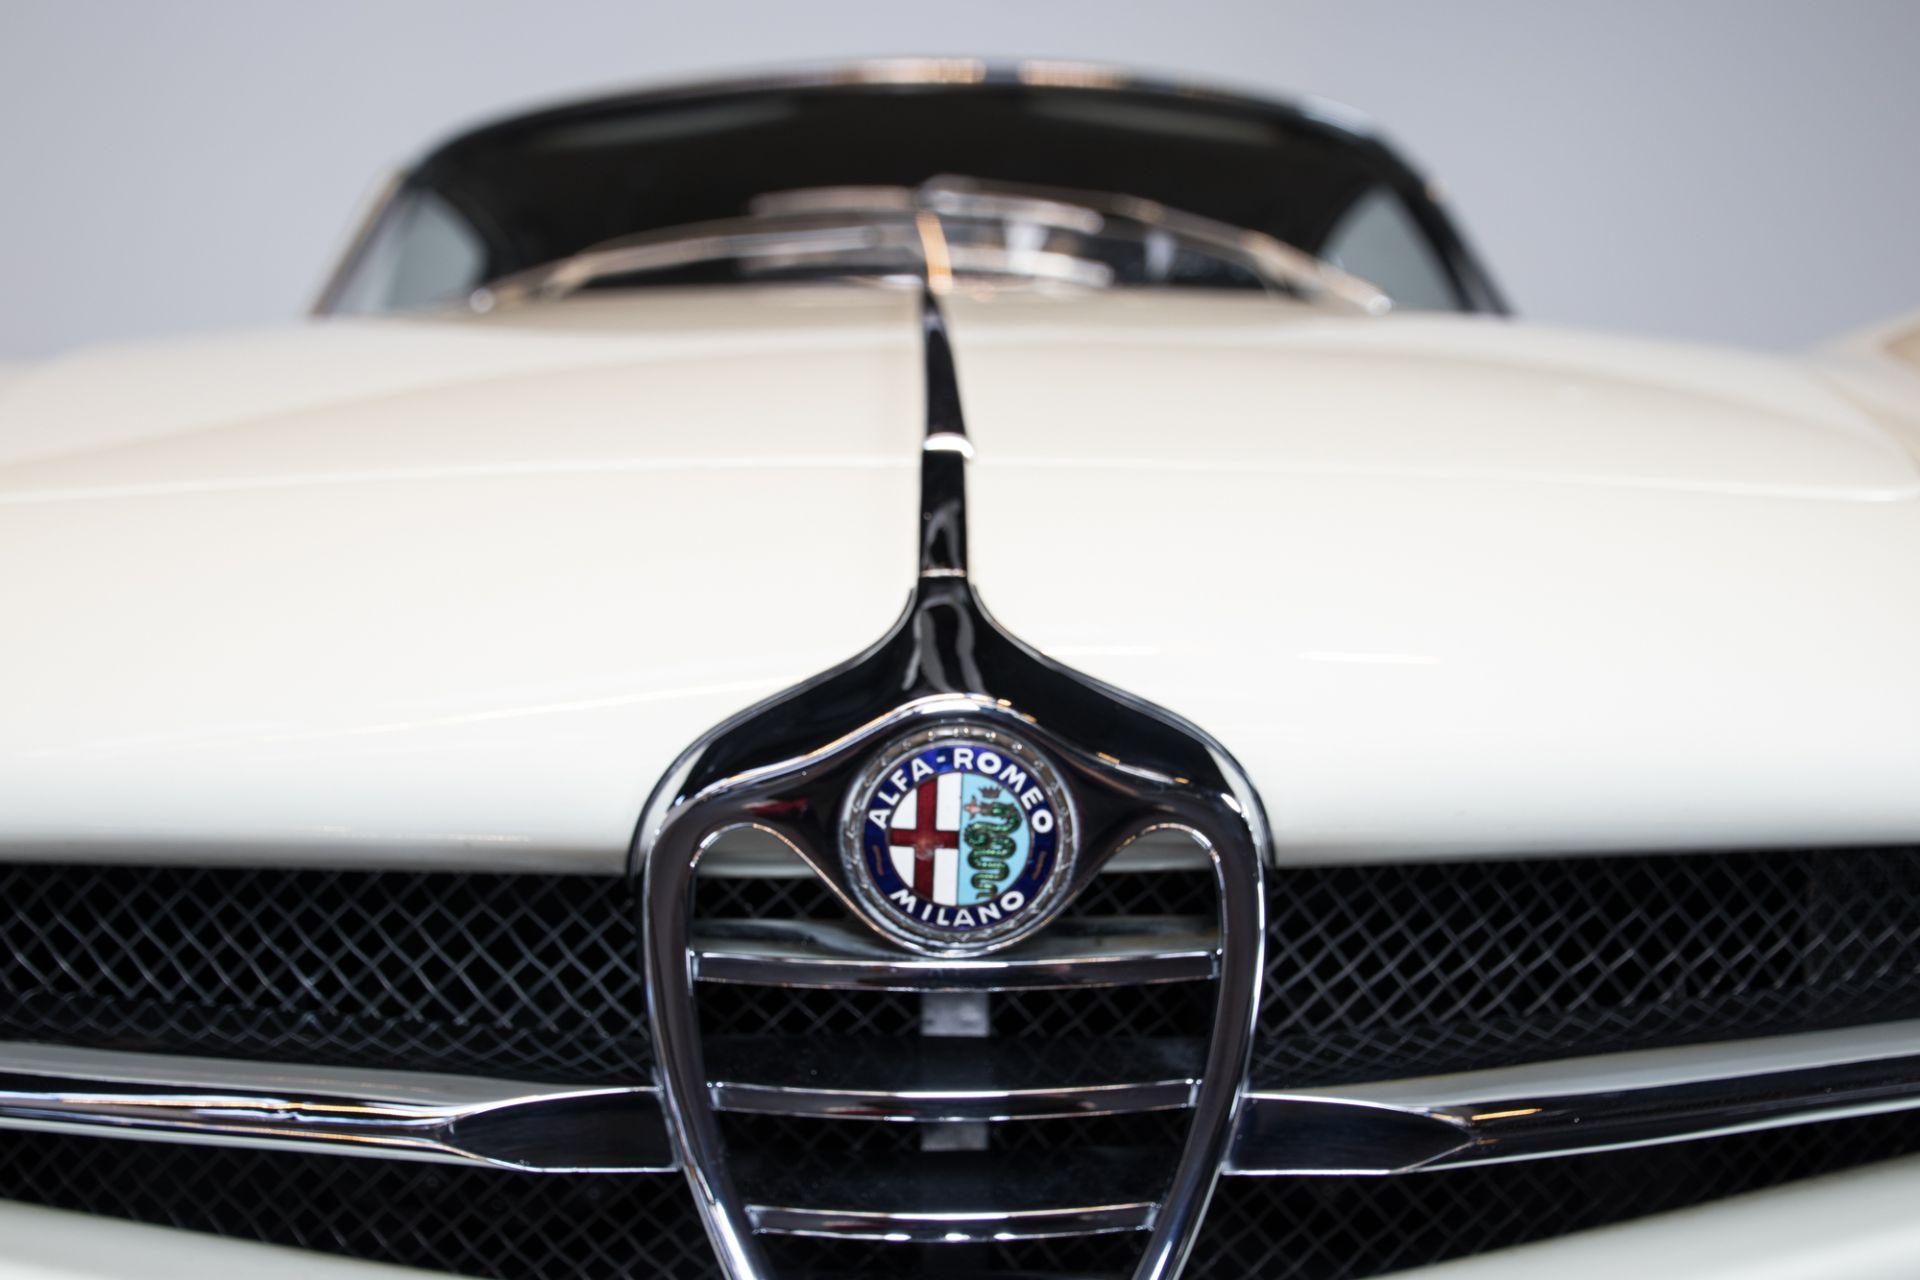 1961 Alfa Romeo Giulietta Sprint Speciale 4928